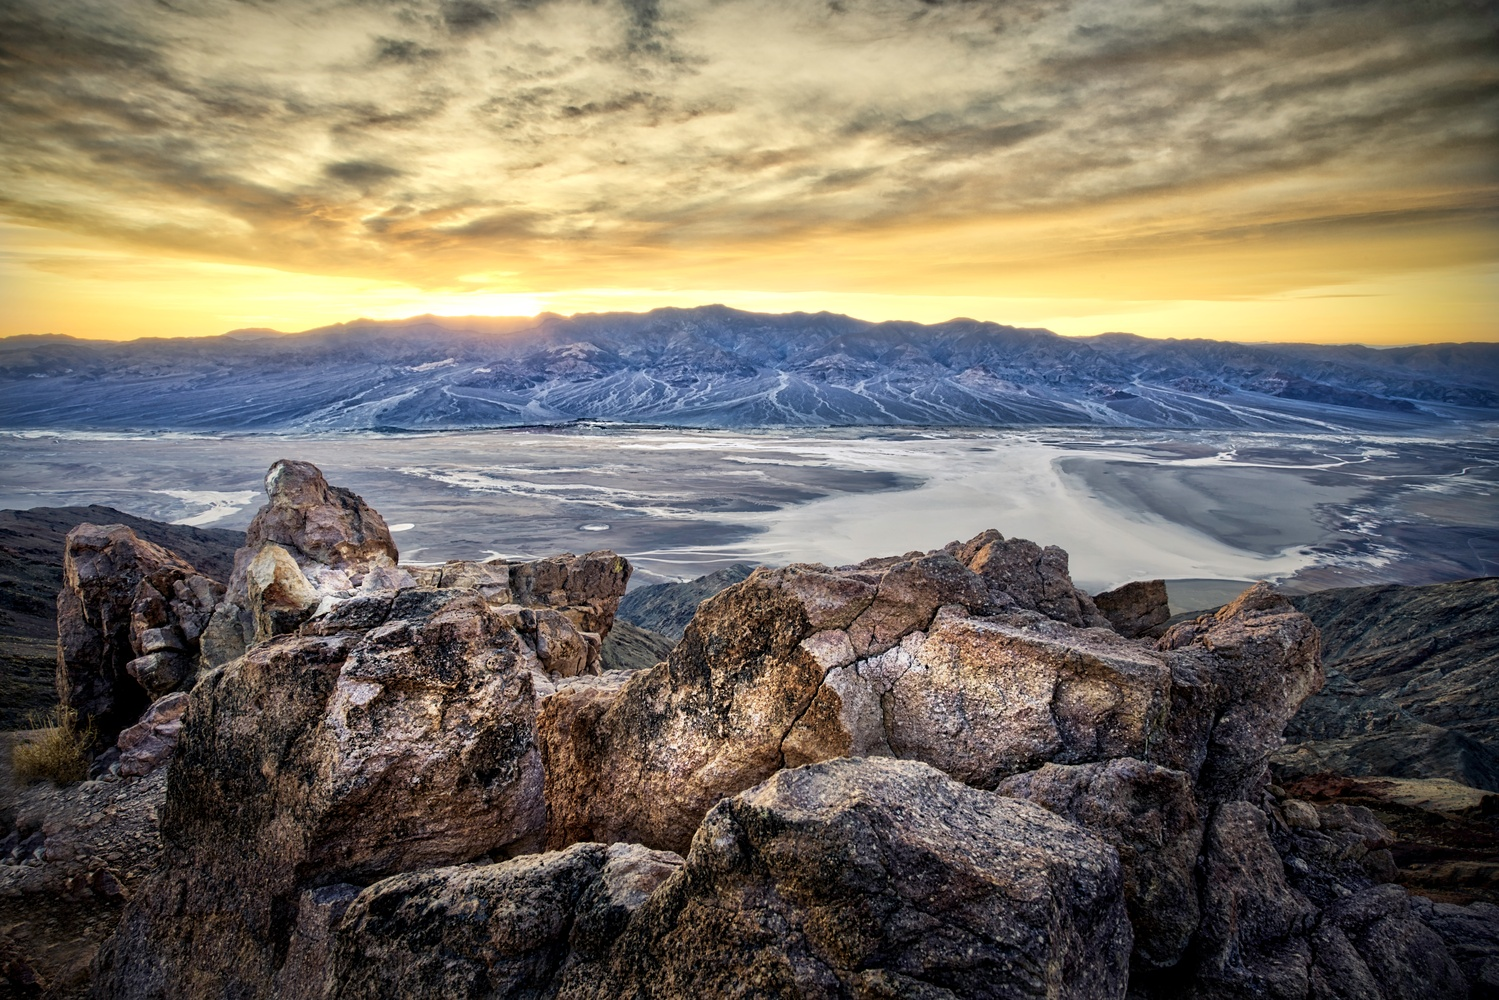 Dante's Peak Death Valley by Daniel Wishard